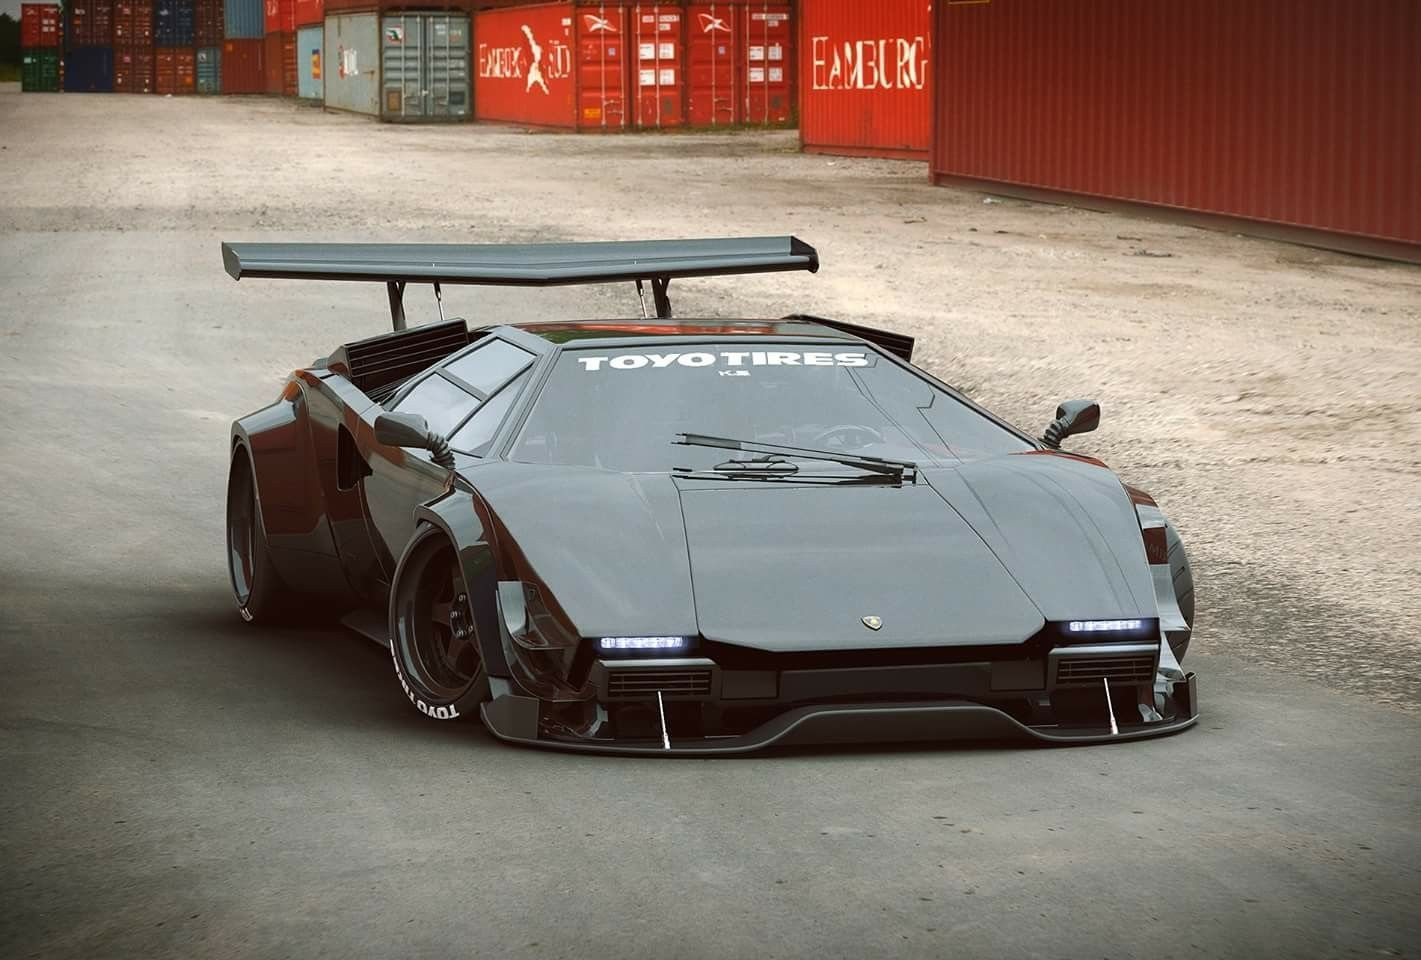 Lamborghini Countach Concept Gtr Import Pinterest Lamborghini Cars And Vehicle